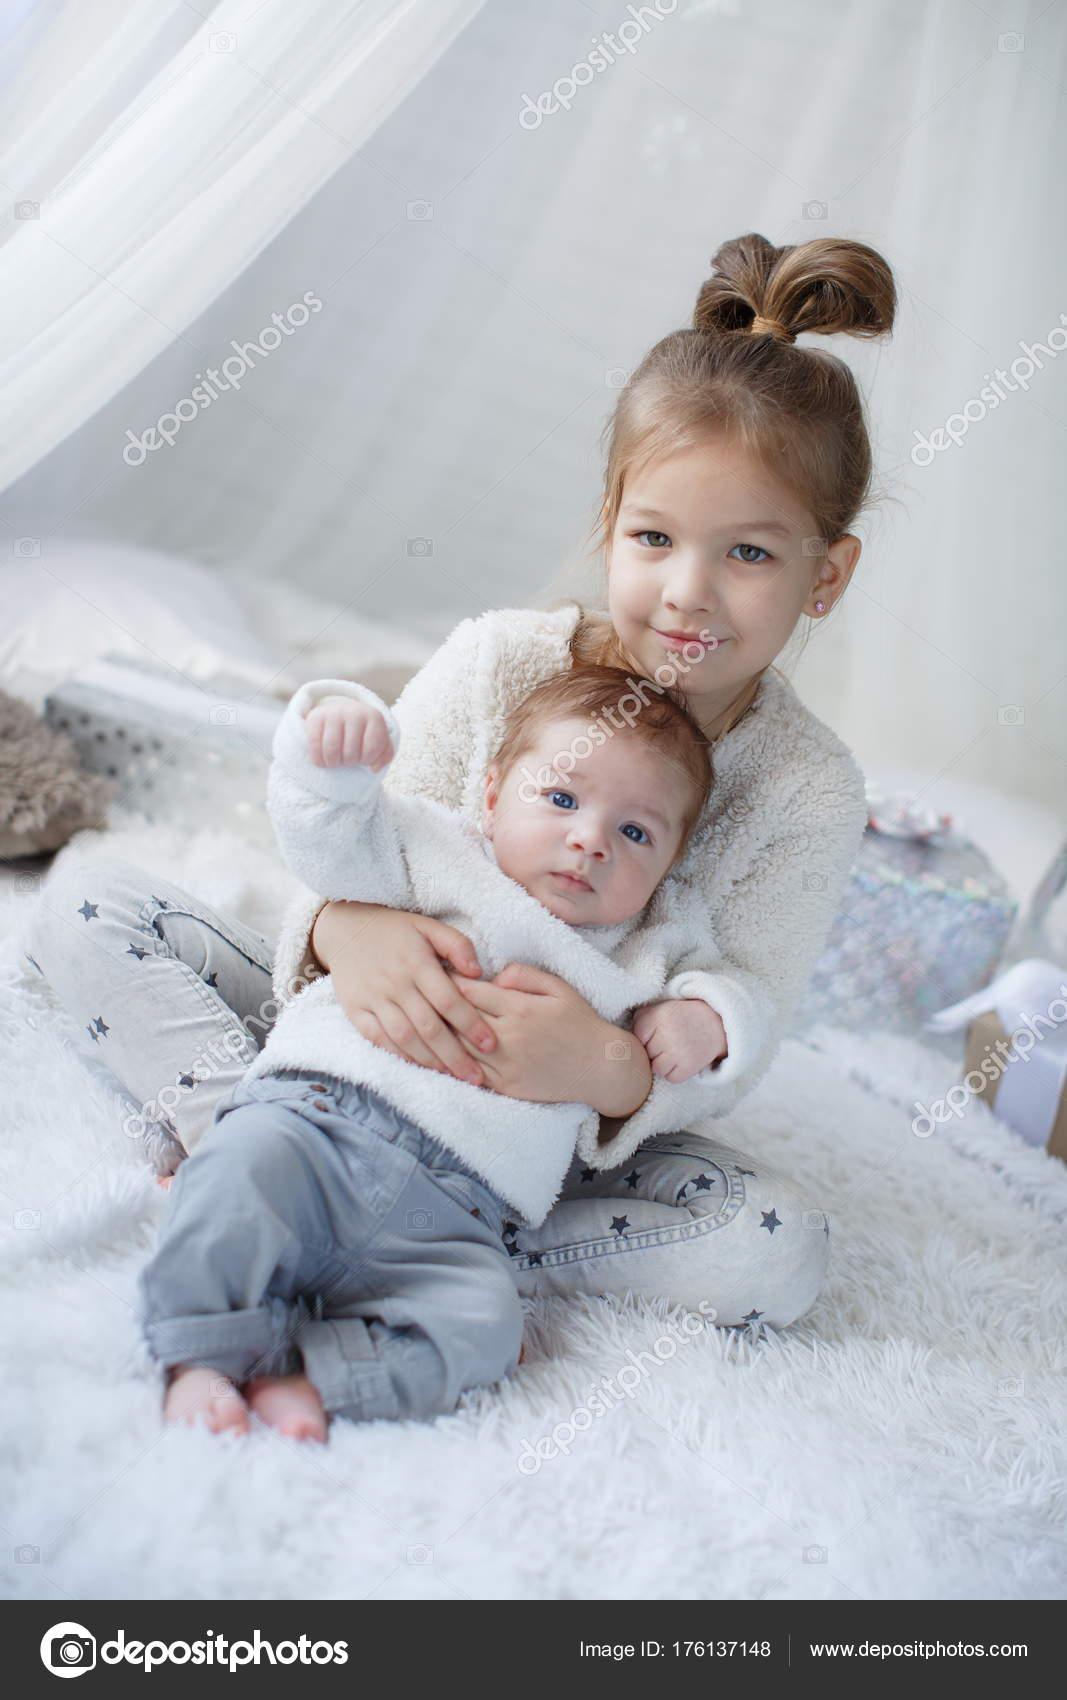 little girl embracing newborn baby brother little girl baby boy